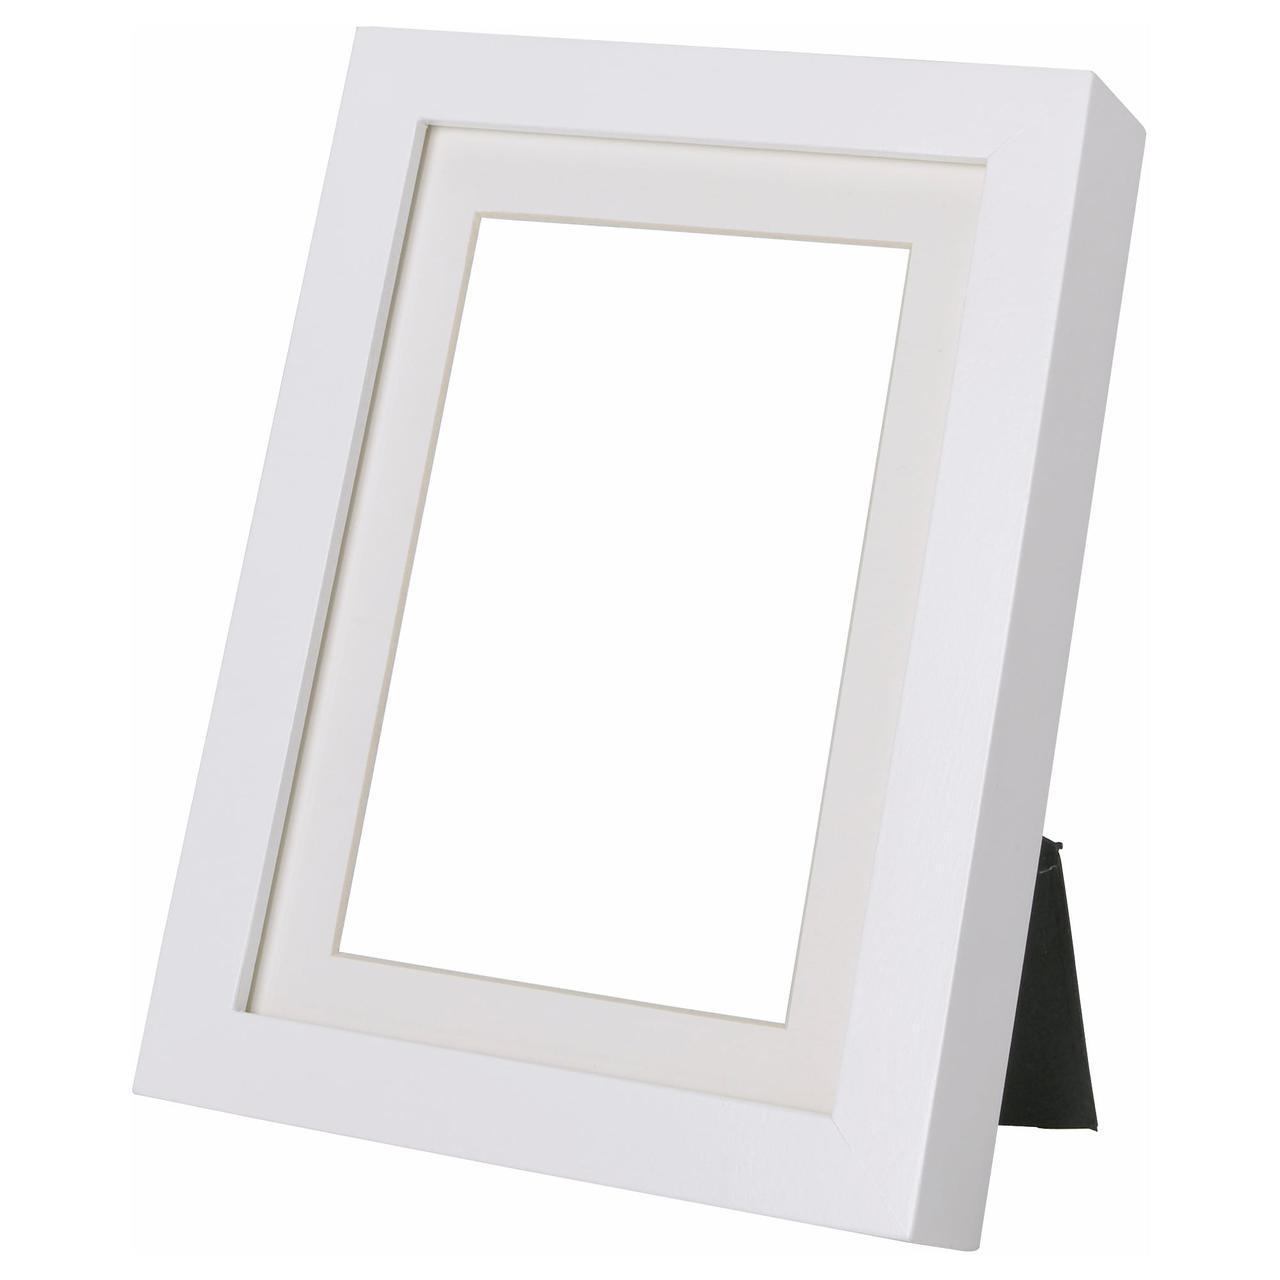 ✅ IKEA RIBBA (703.784.14) Рамка белая